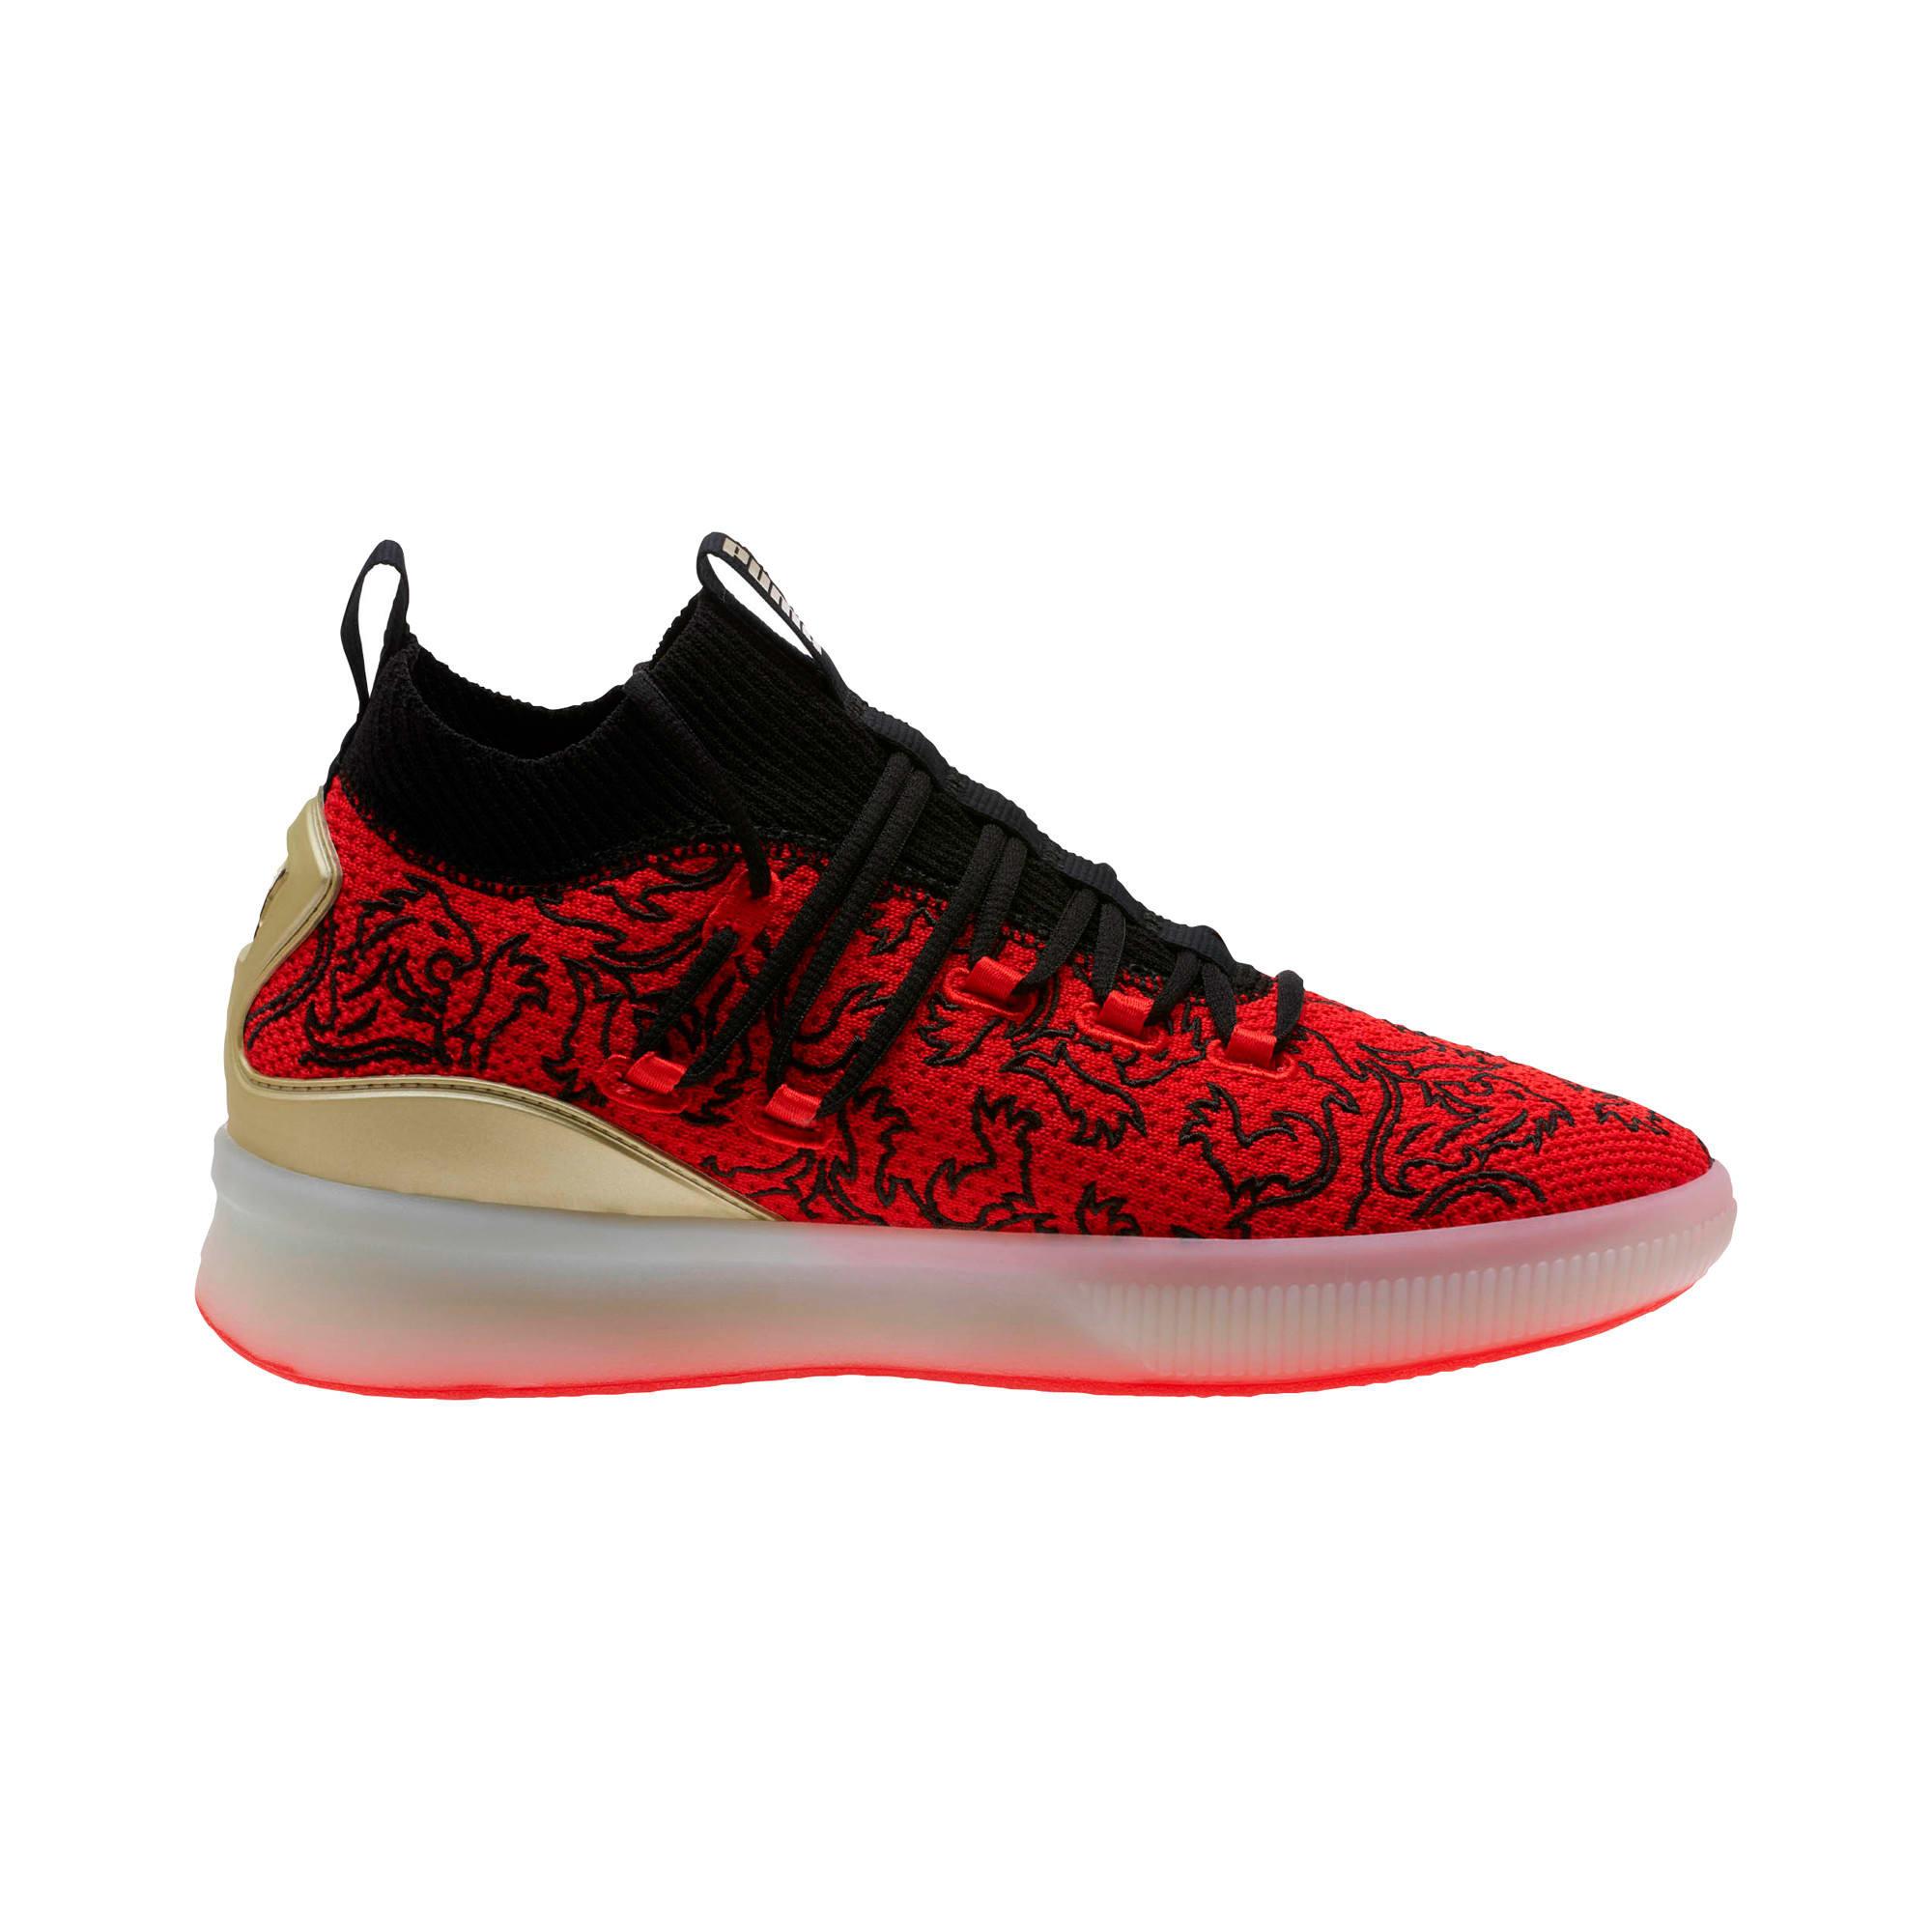 Imagen en miniatura 4 de Zapatillas de baloncesto de hombre Clyde Court London, High Risk Red-Puma Black, mediana